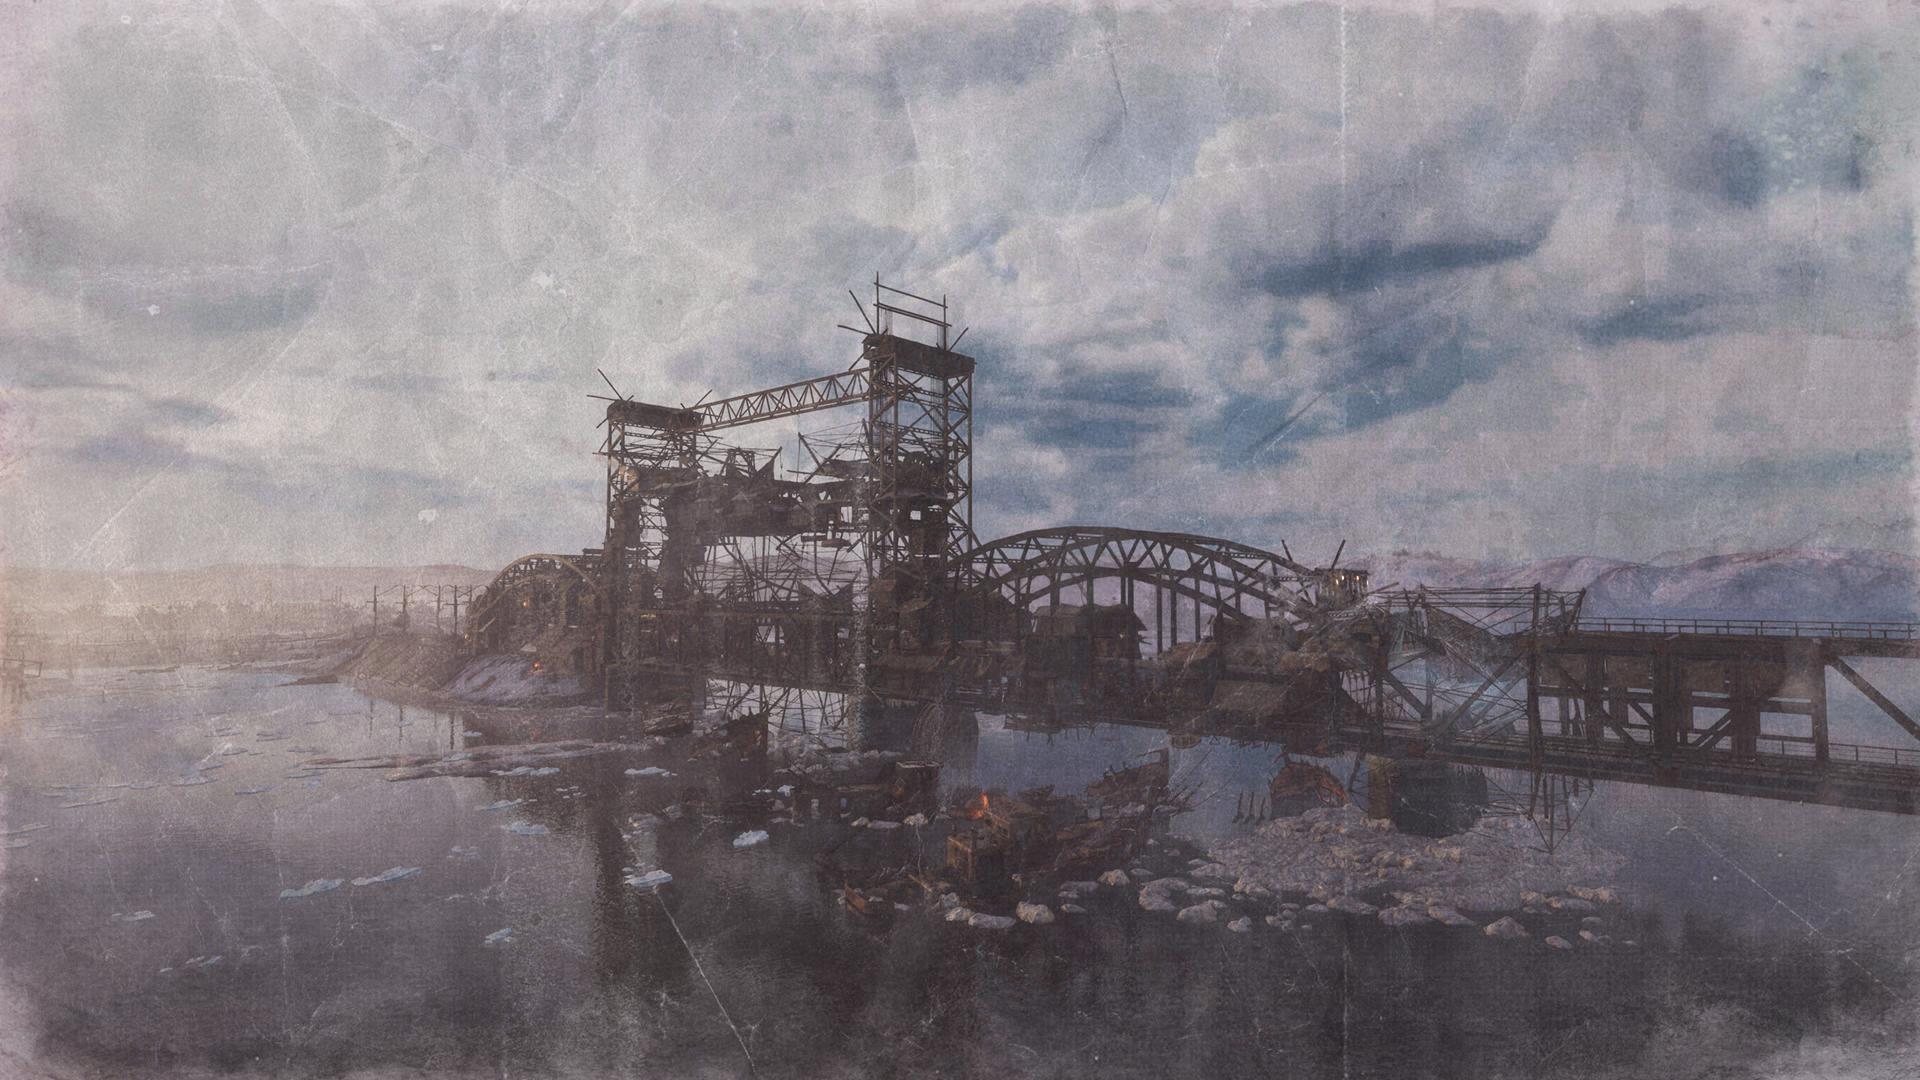 Lower the Bridge